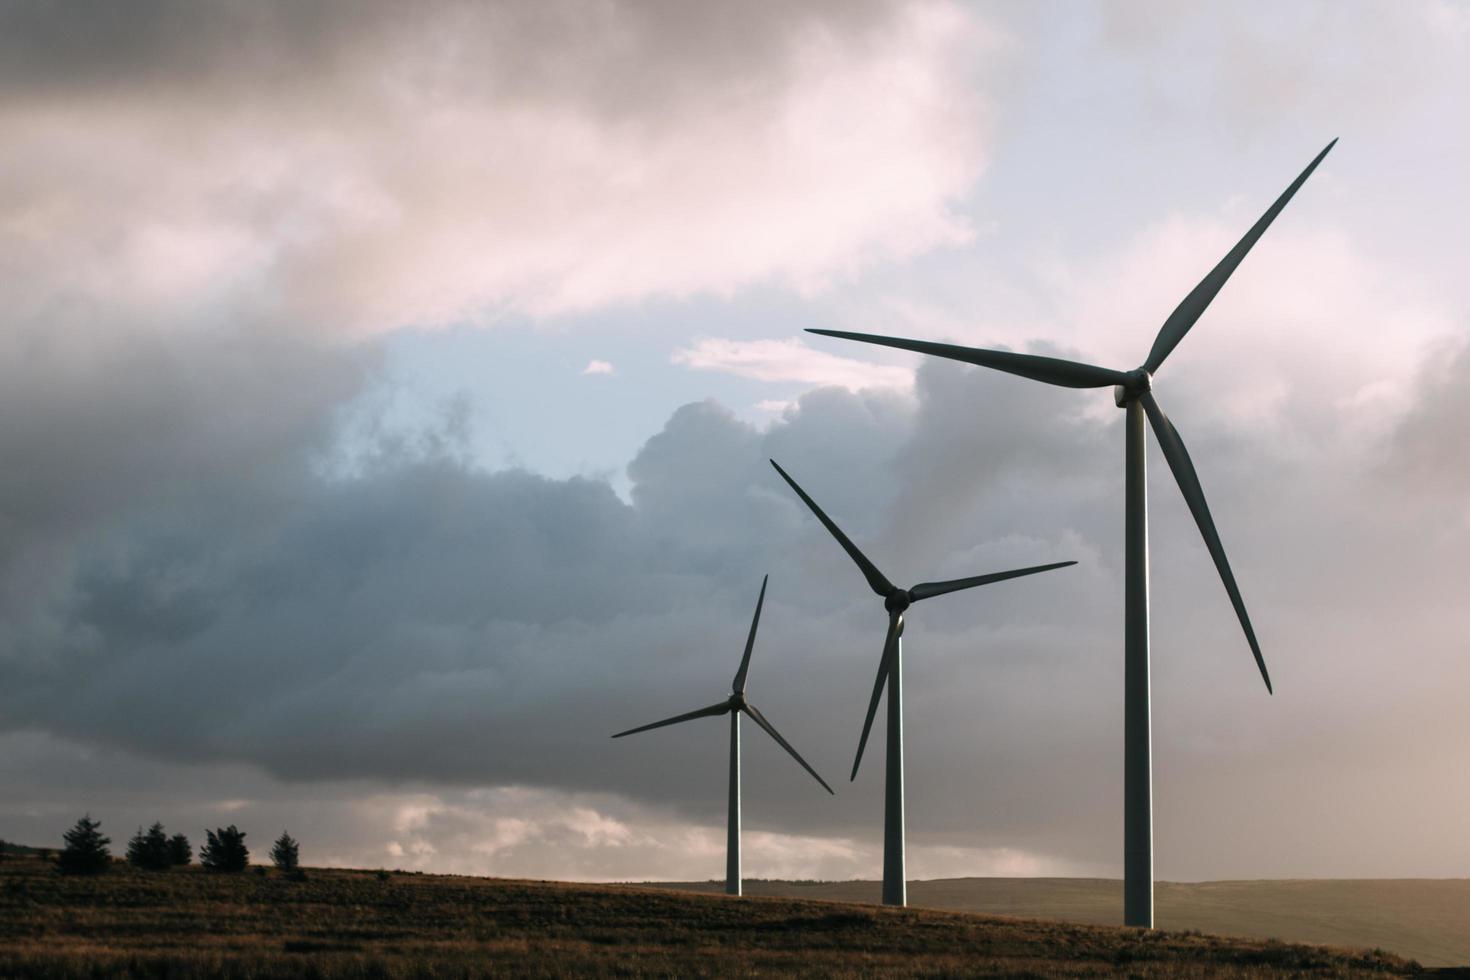 Windkraftanlagen im Feld mit bewölktem Himmel foto